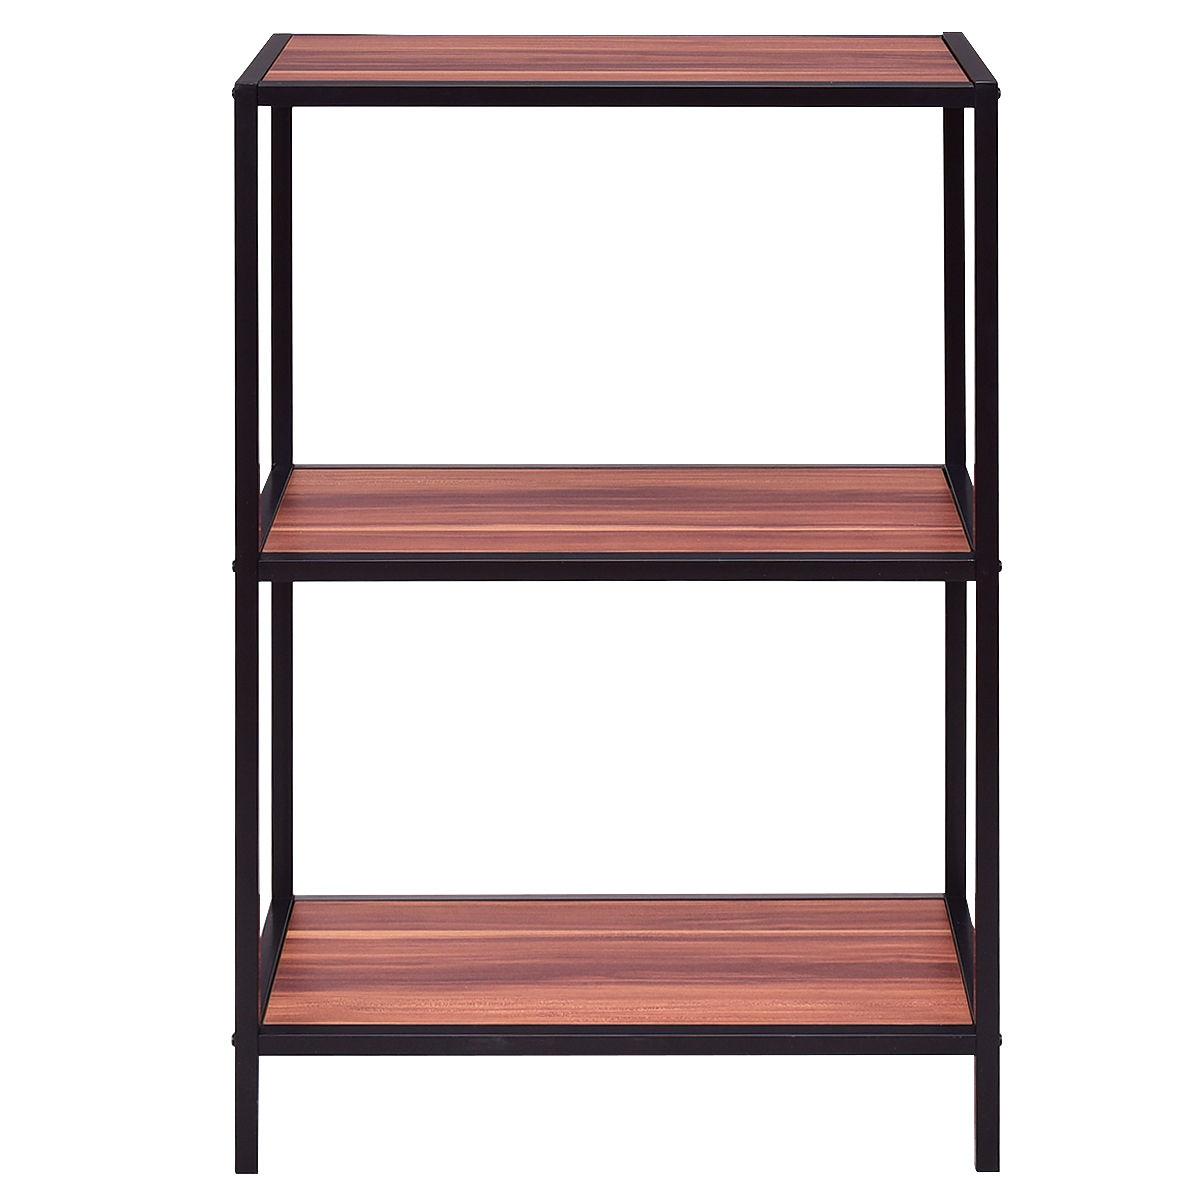 3-Tier Portable Metal Frame Storage Shelf